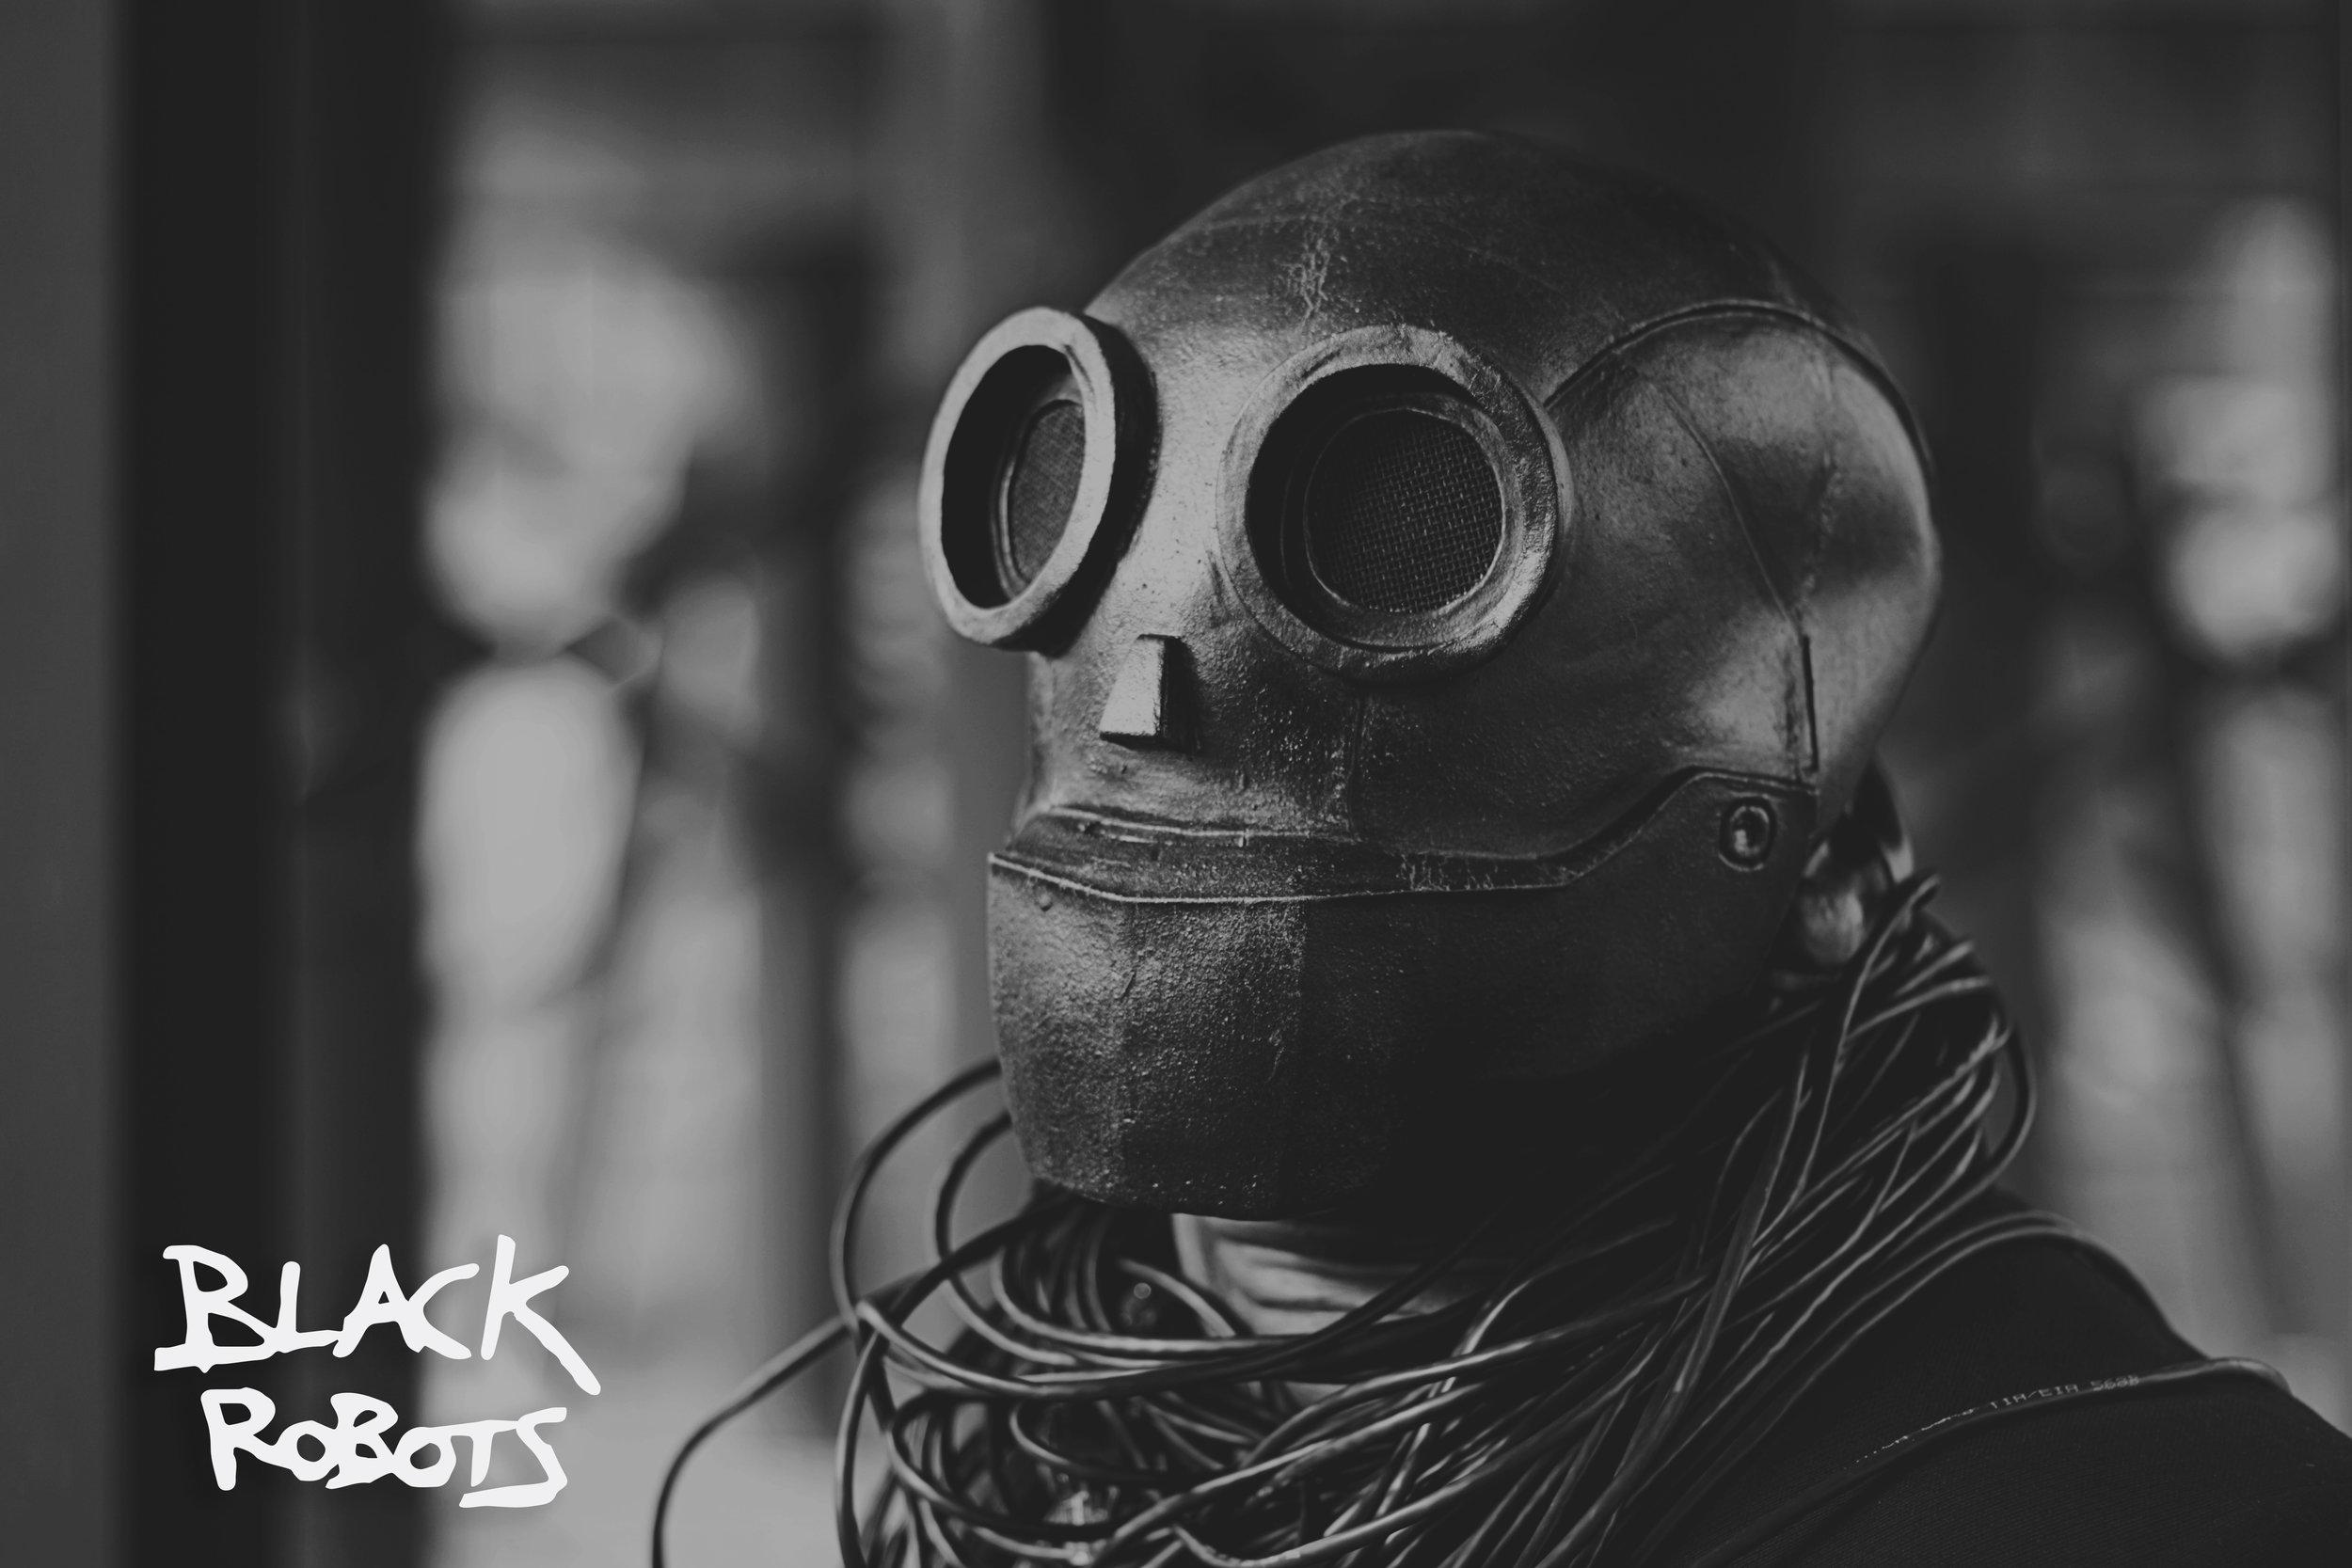 Black Robots photo credit: The Art of James E. Walker